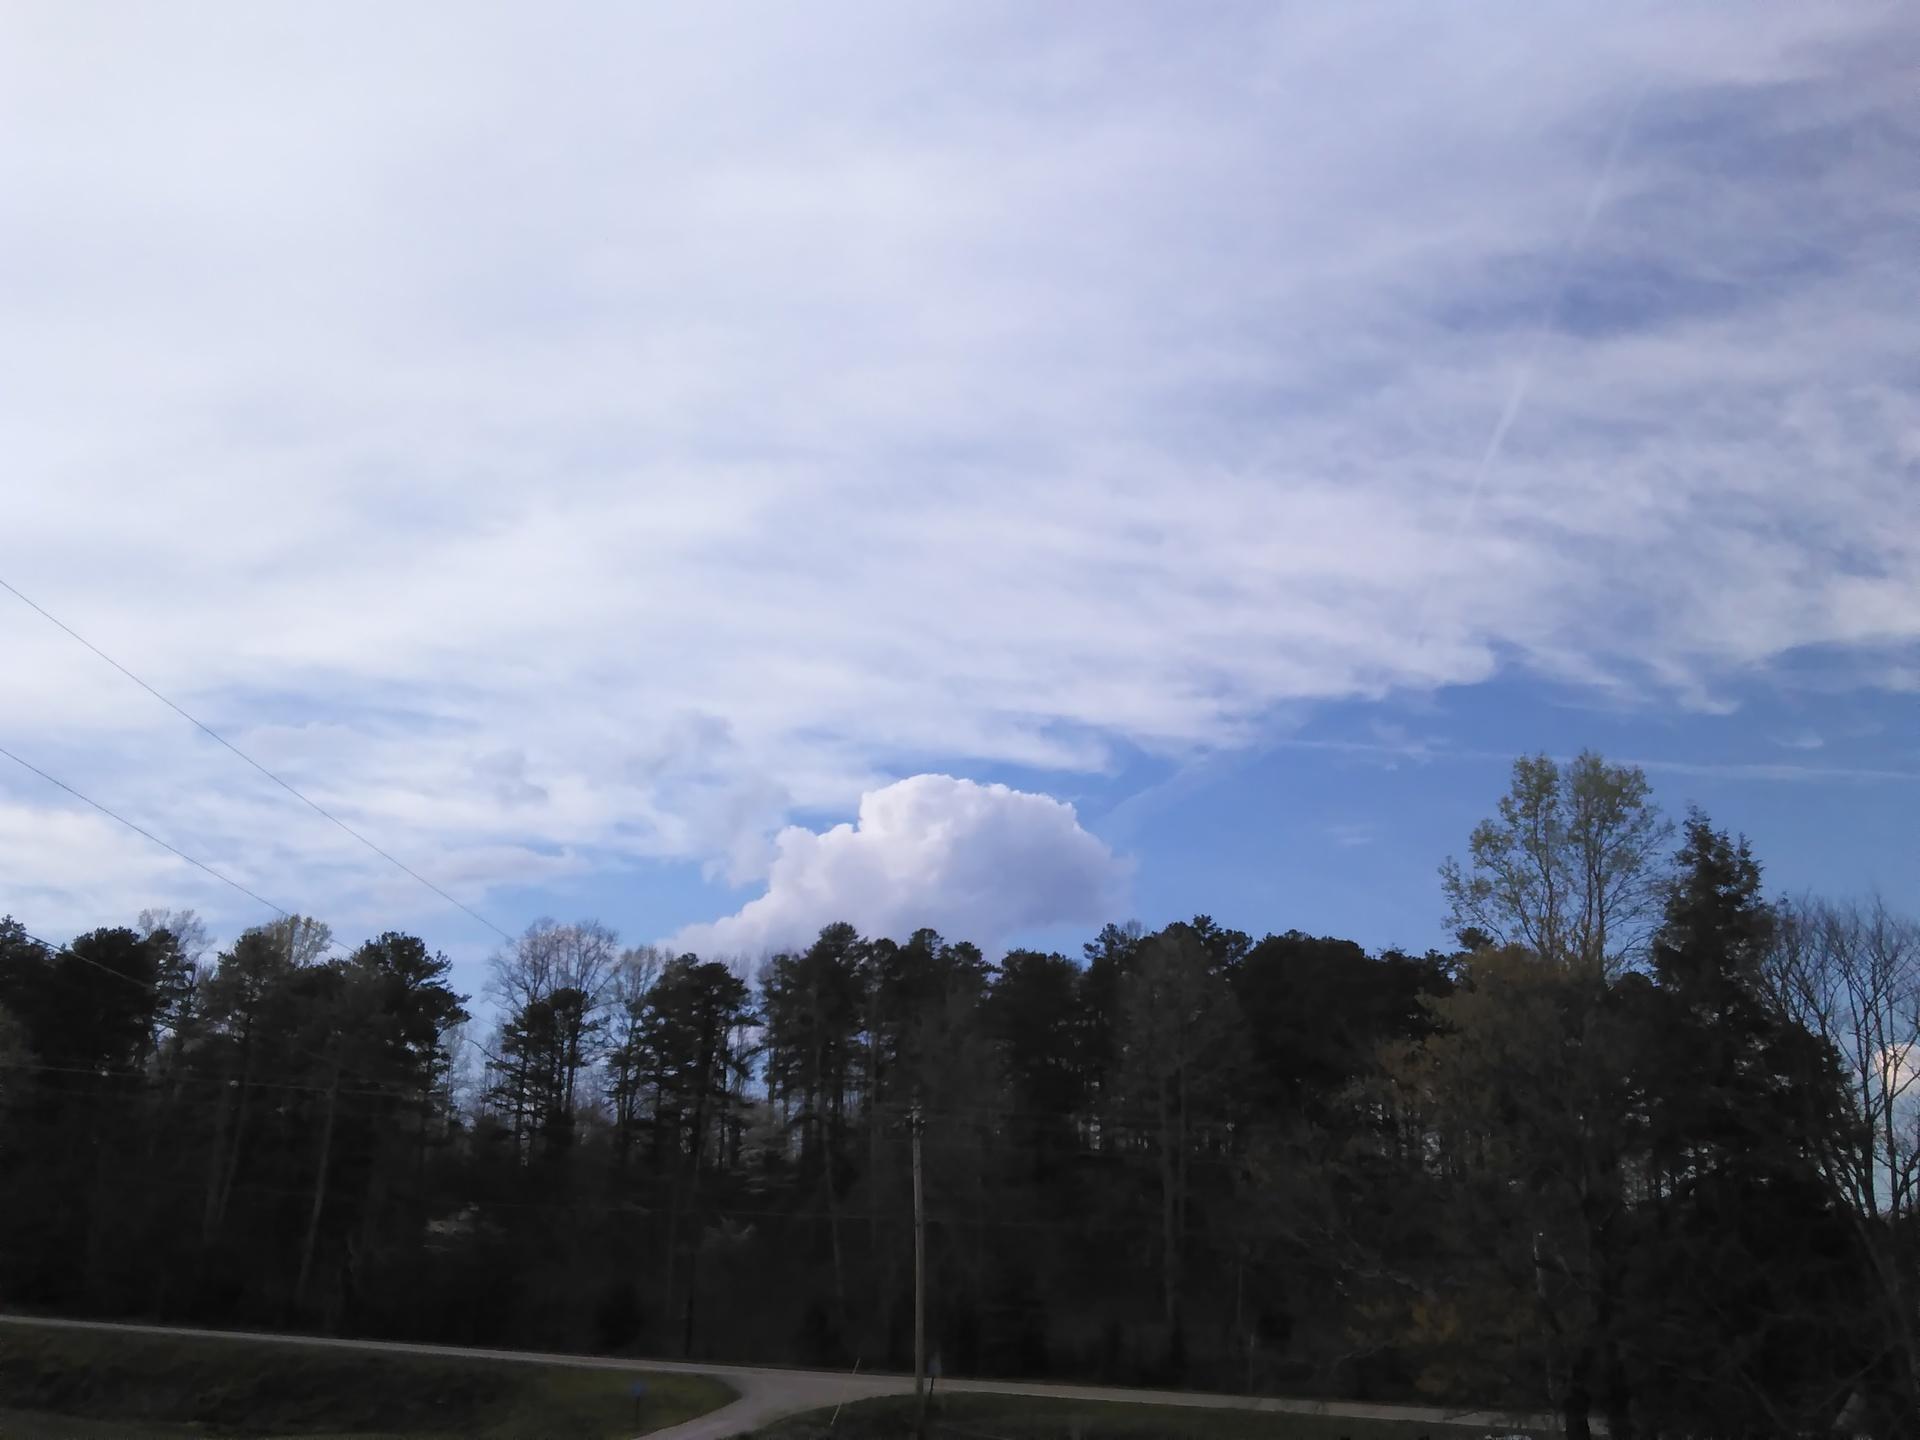 Lazy cloud over forest | codenamesailorearth, environment, landscape, nature